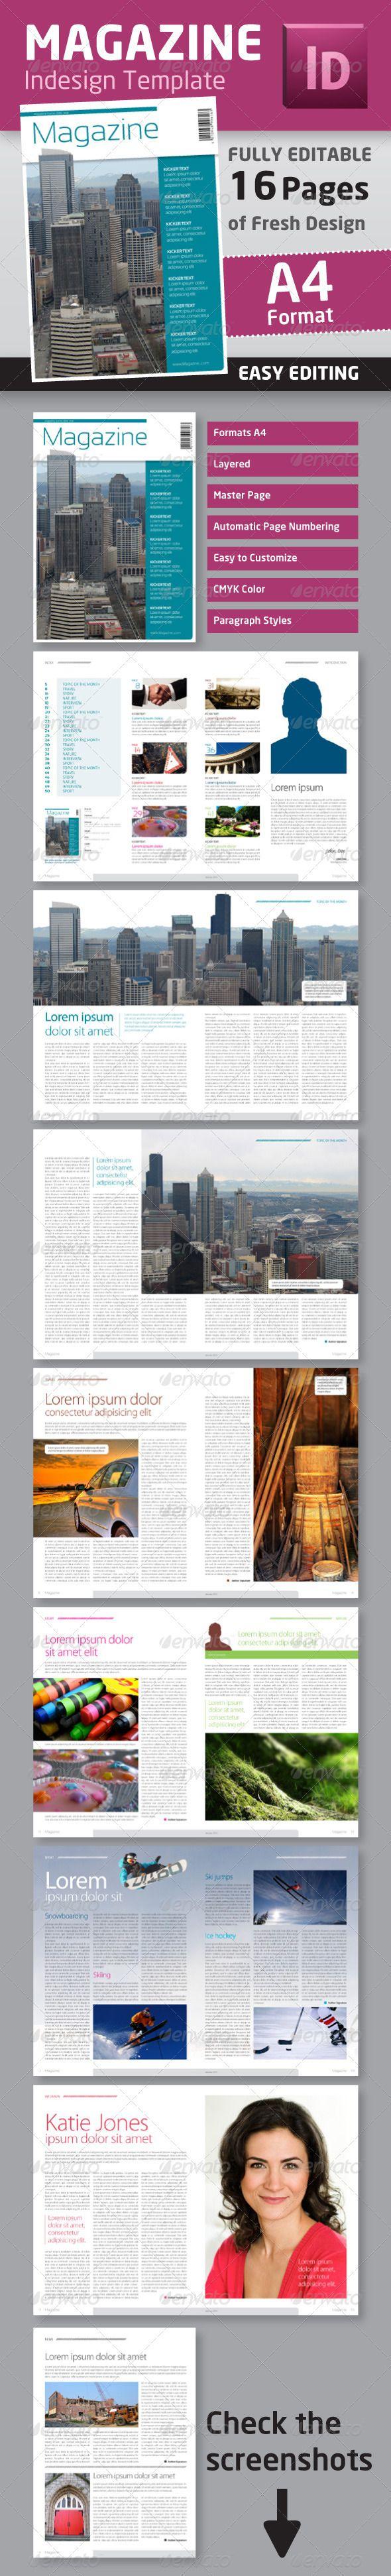 17 best images about indesign tut trix on pinterest adobe texts and adobe indesign. Black Bedroom Furniture Sets. Home Design Ideas